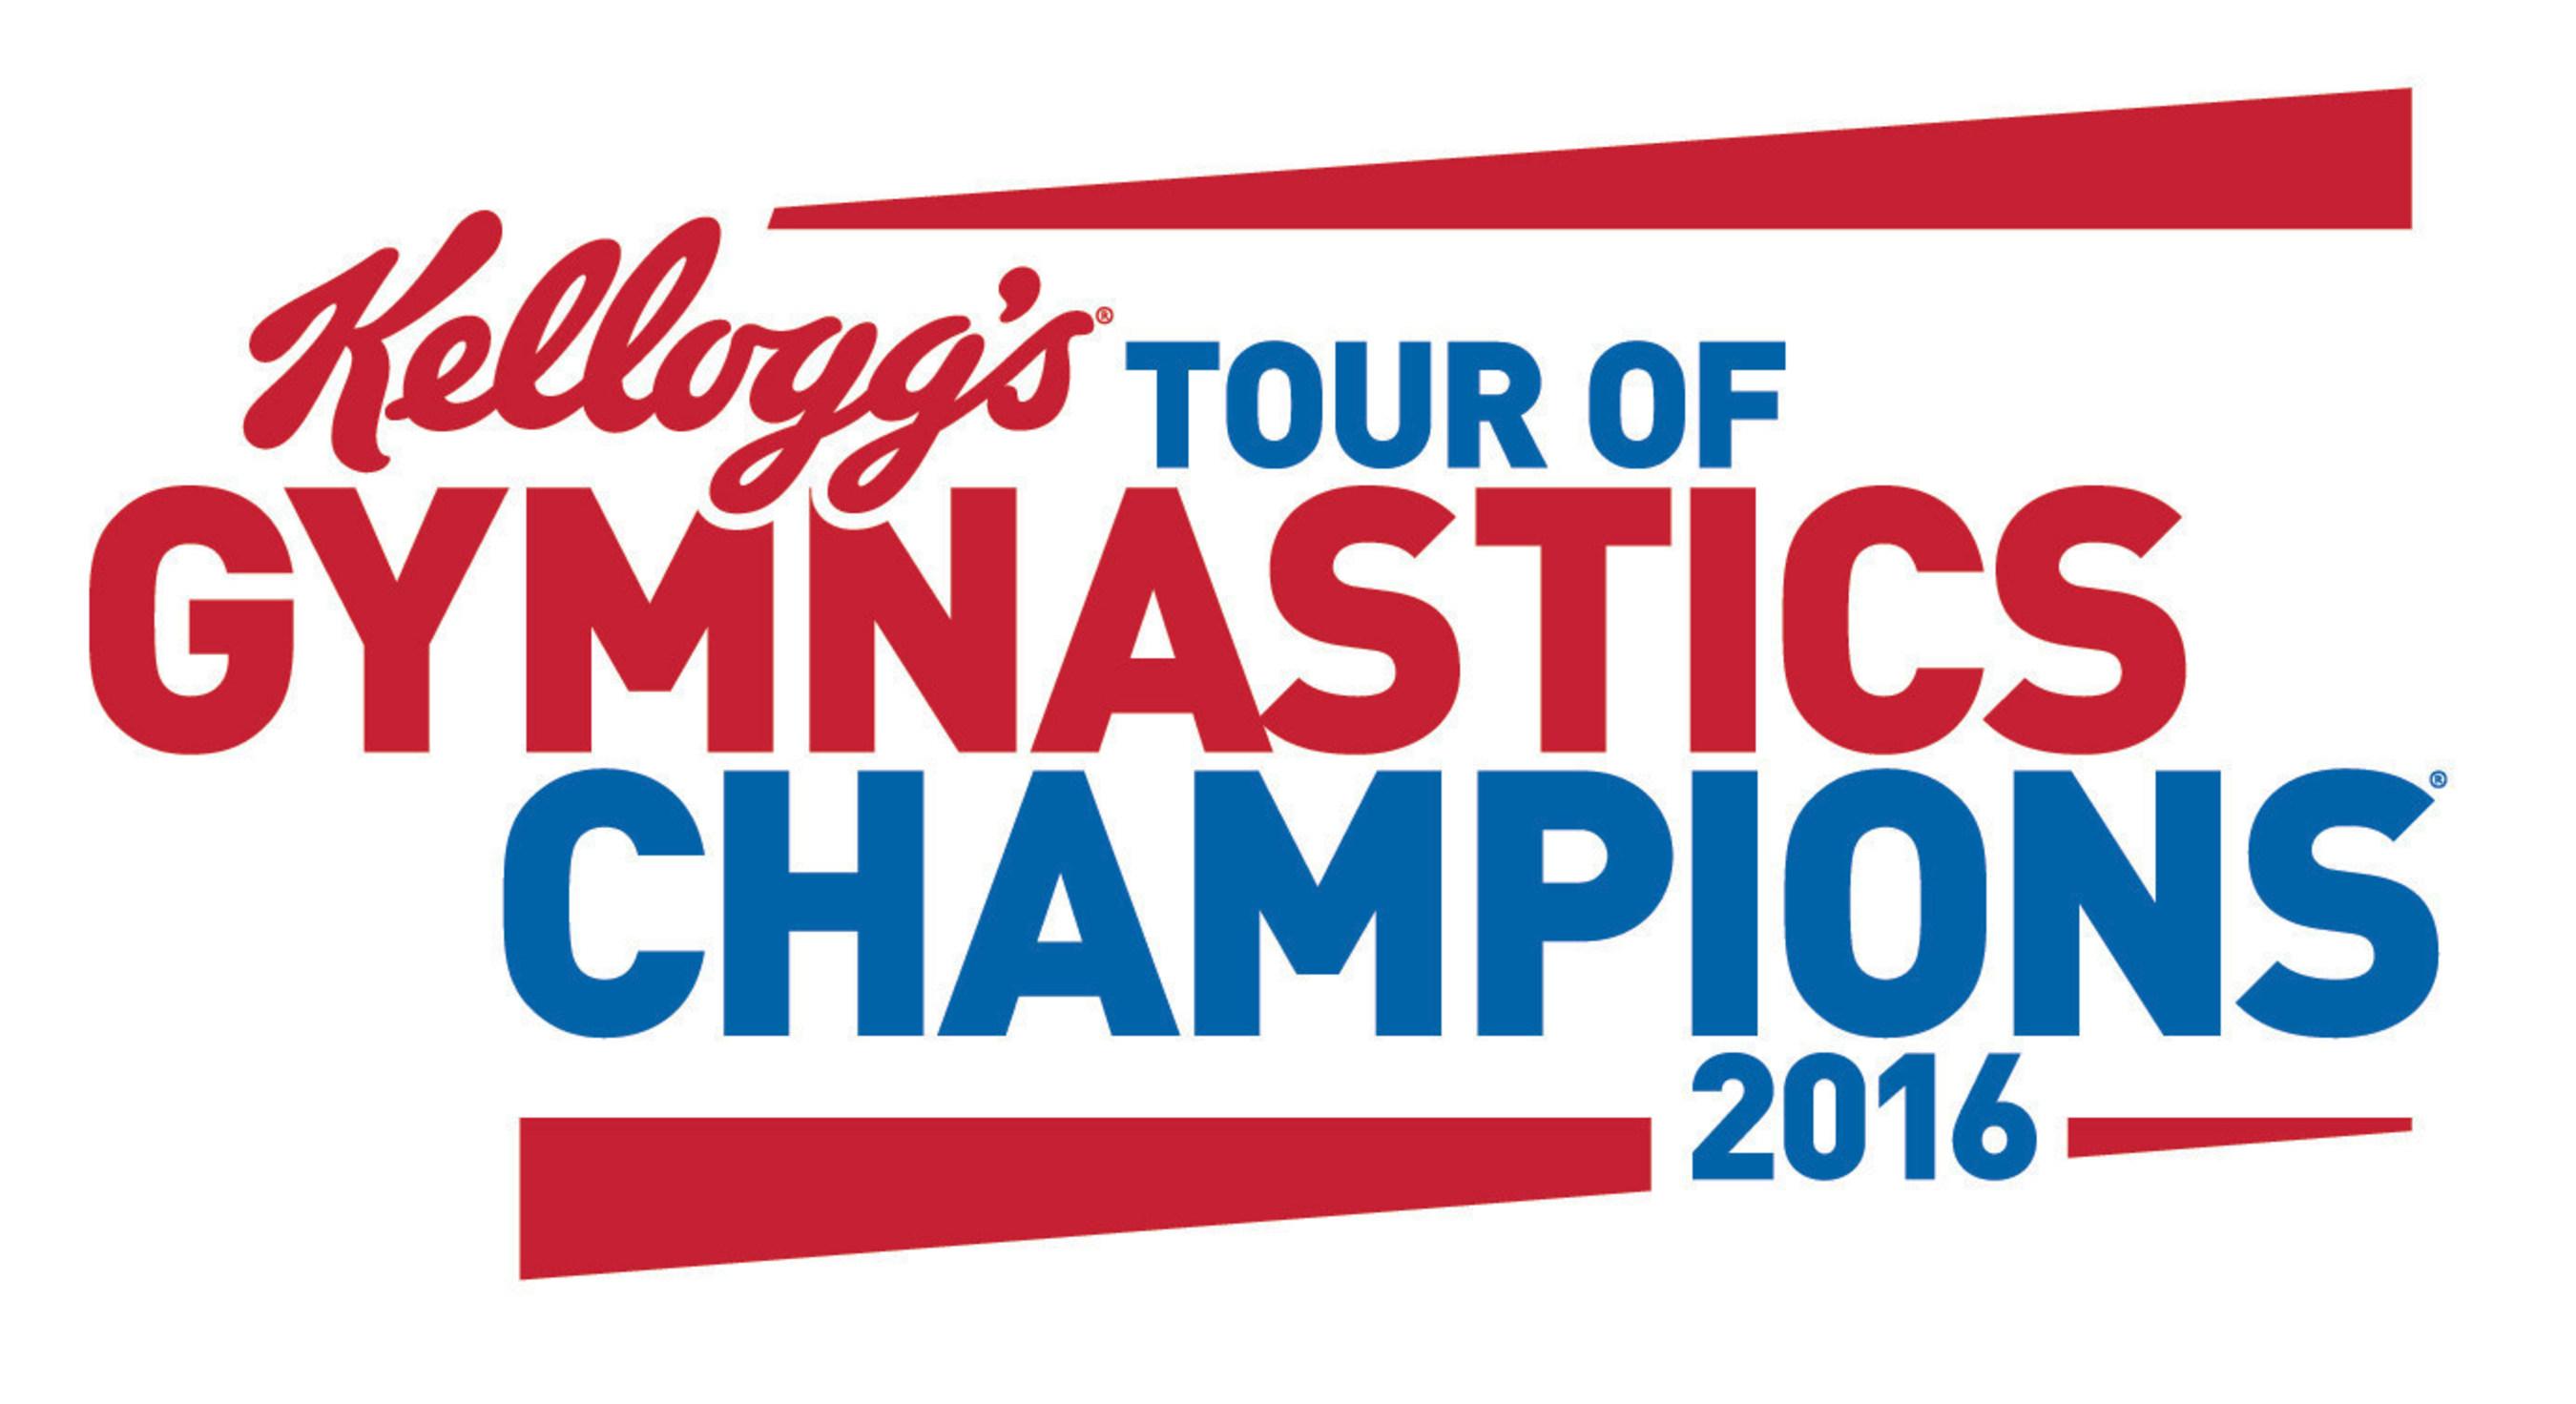 2016 Kellogg's(R) Tour of Gymnastics Champions